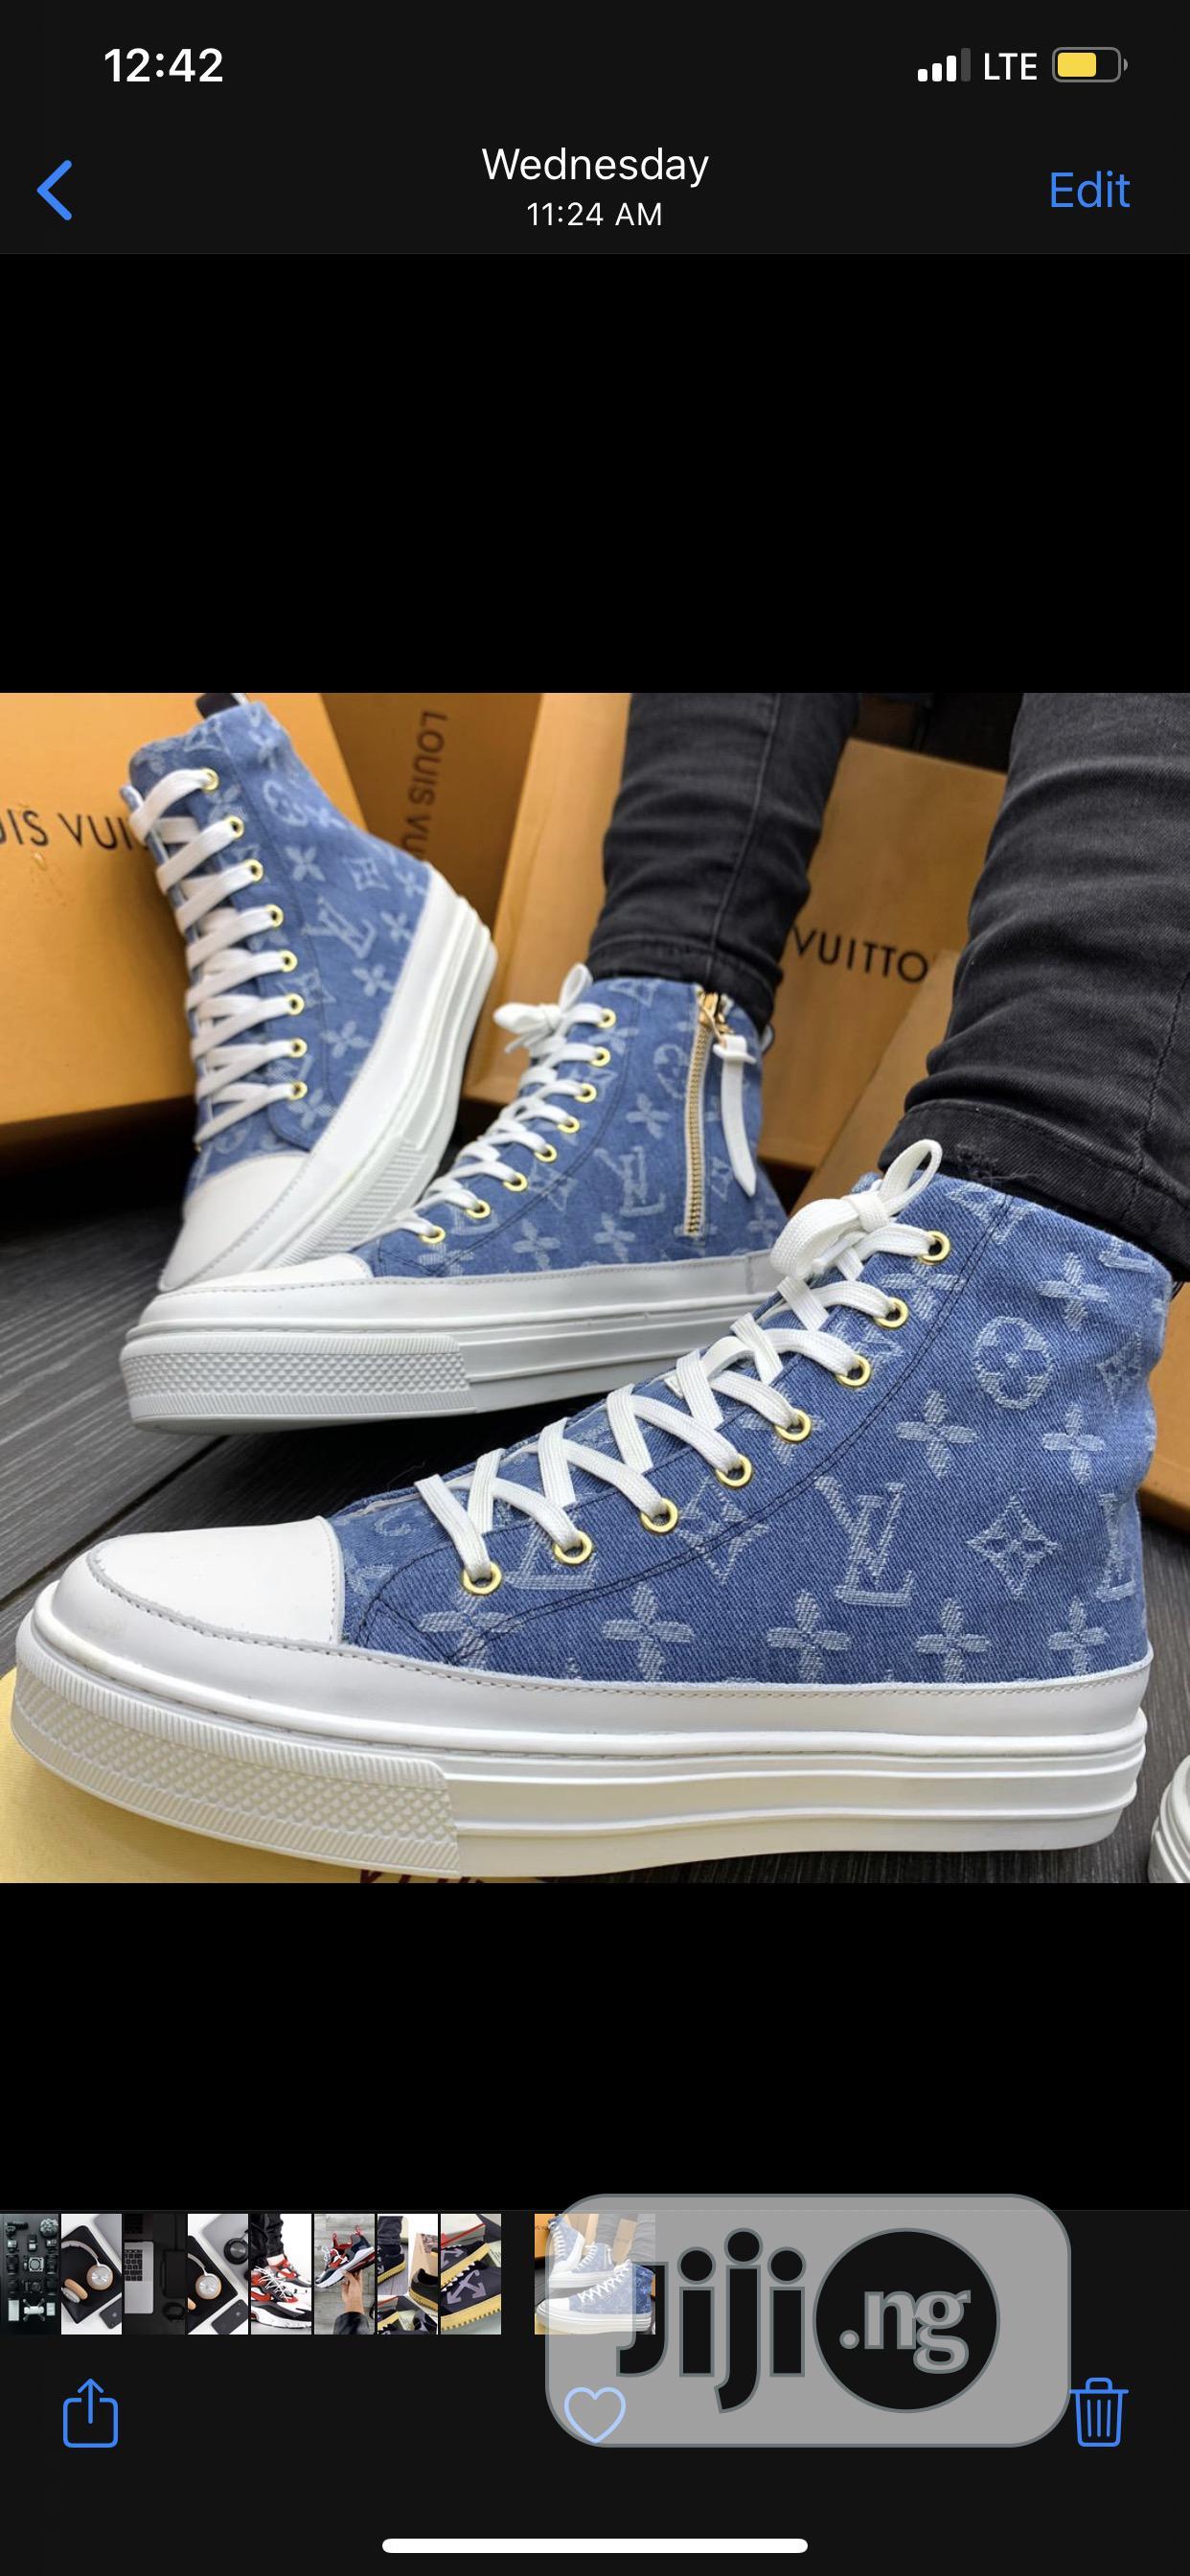 Louis Vuitton Converse High Sneakers